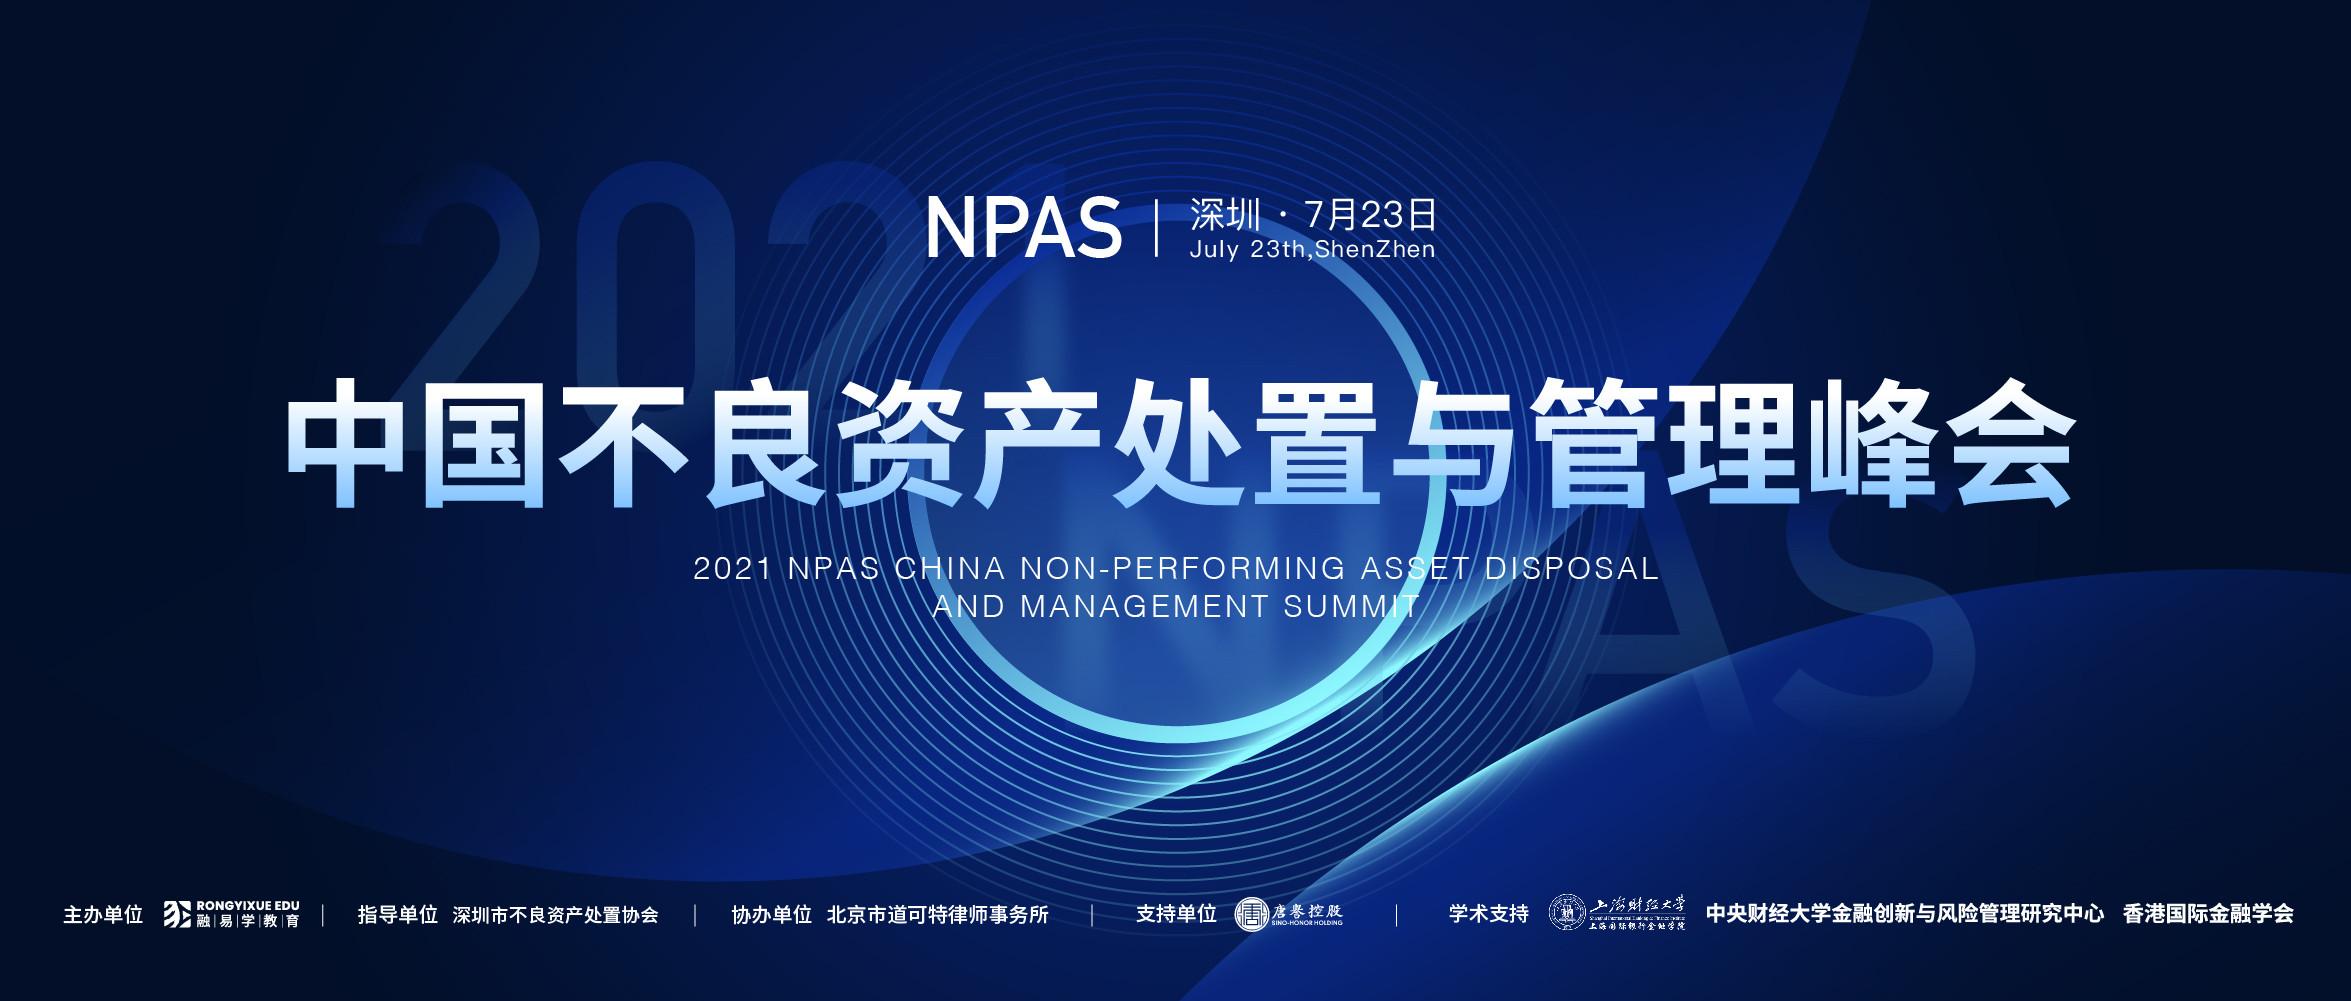 2021NPAS中国不良资产处置与管理峰会